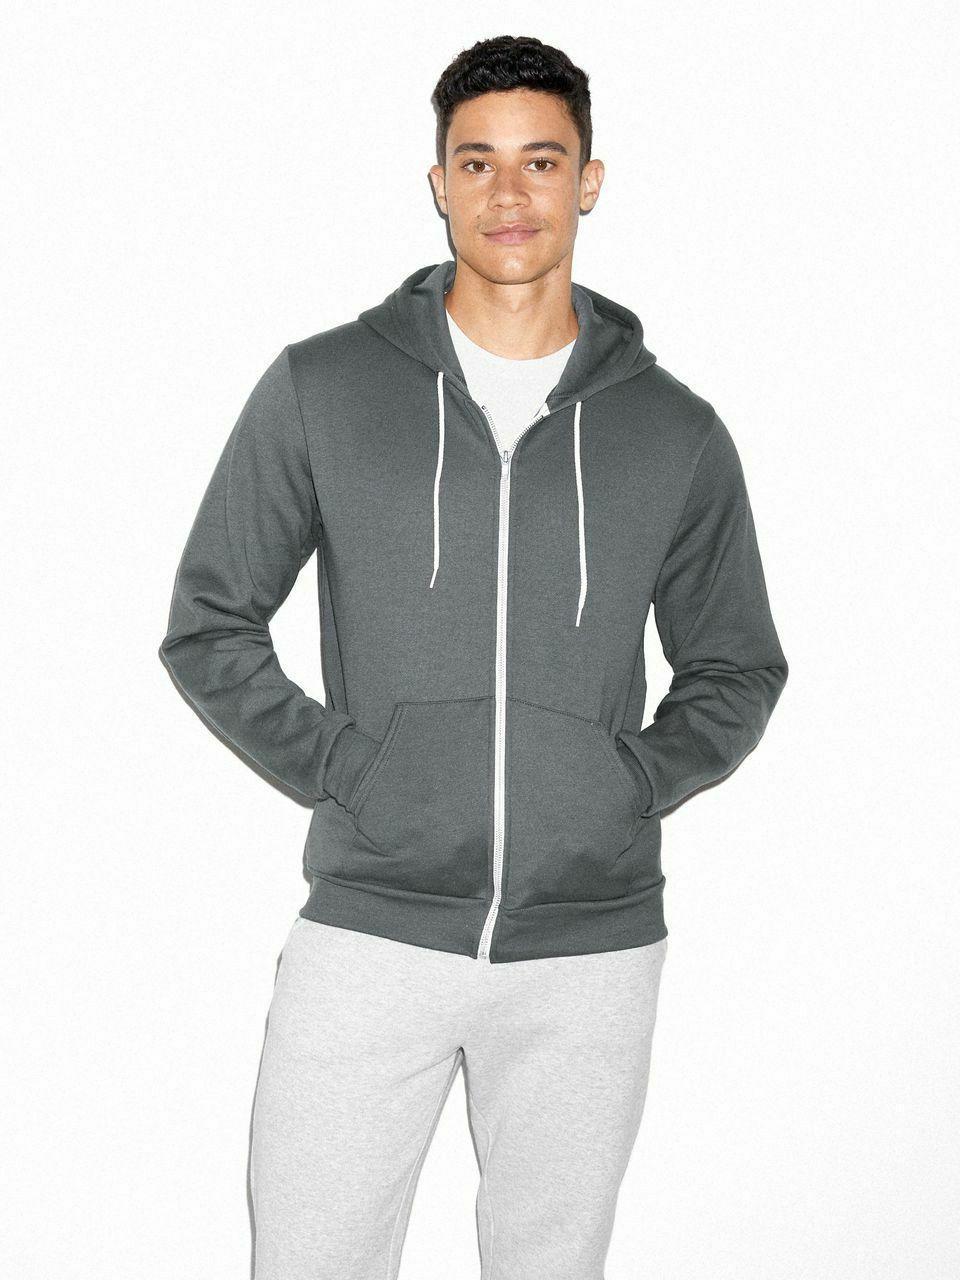 f497w unisex flex fleece zip hoodie stylish